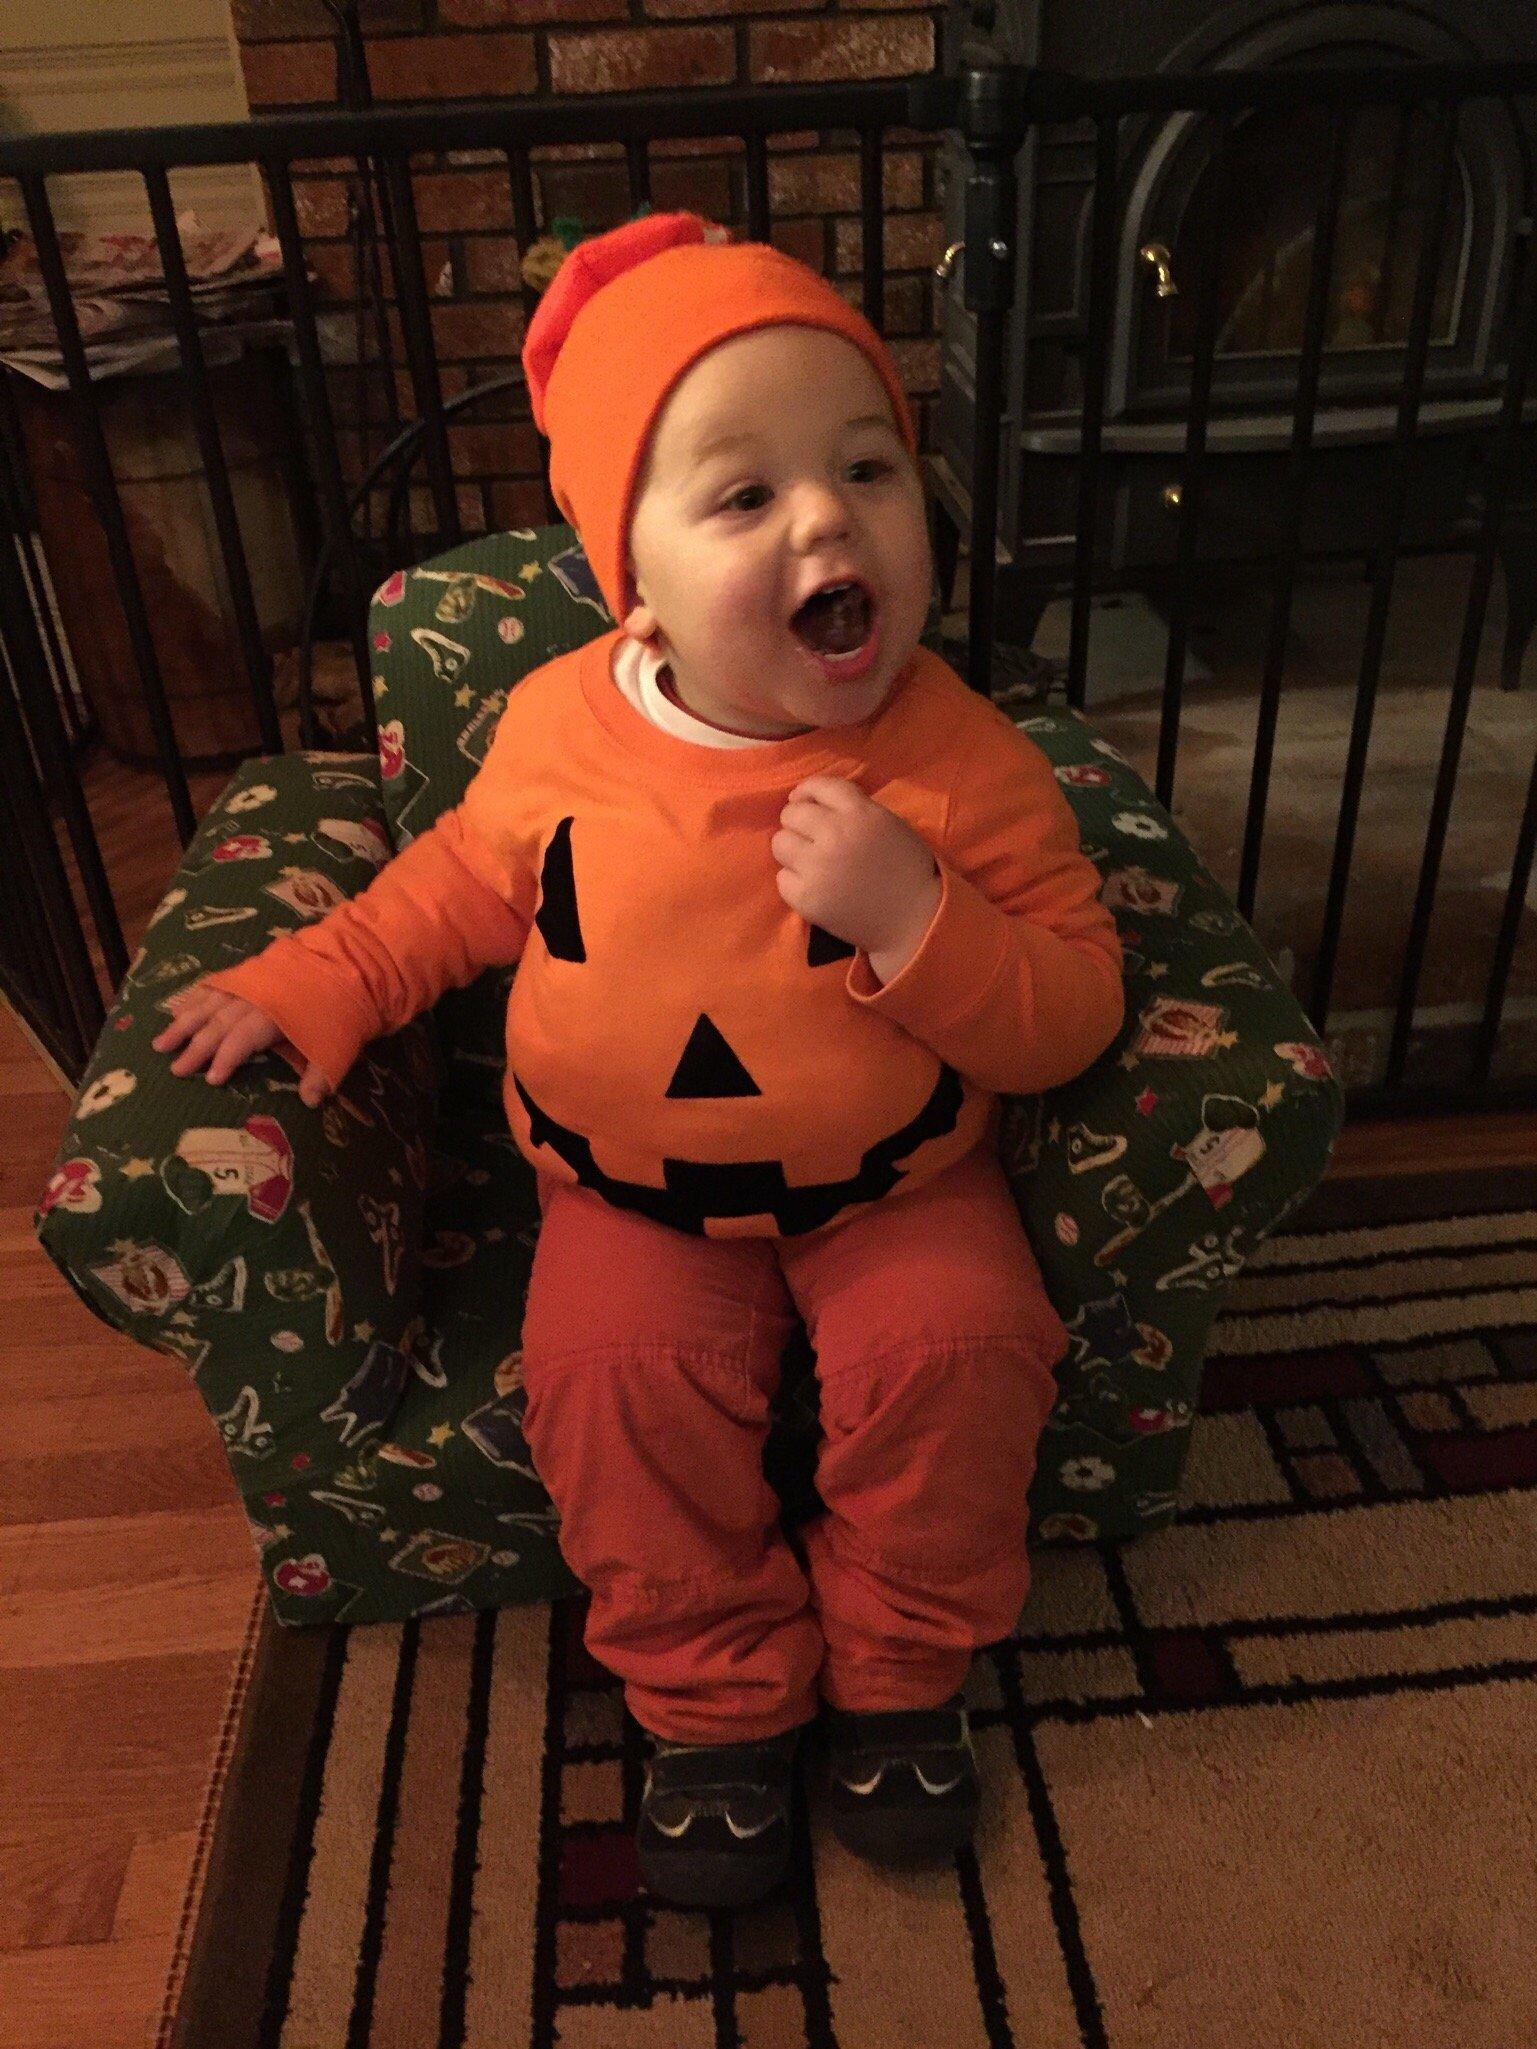 Jack O' Lantern no-sew Halloween costume idea